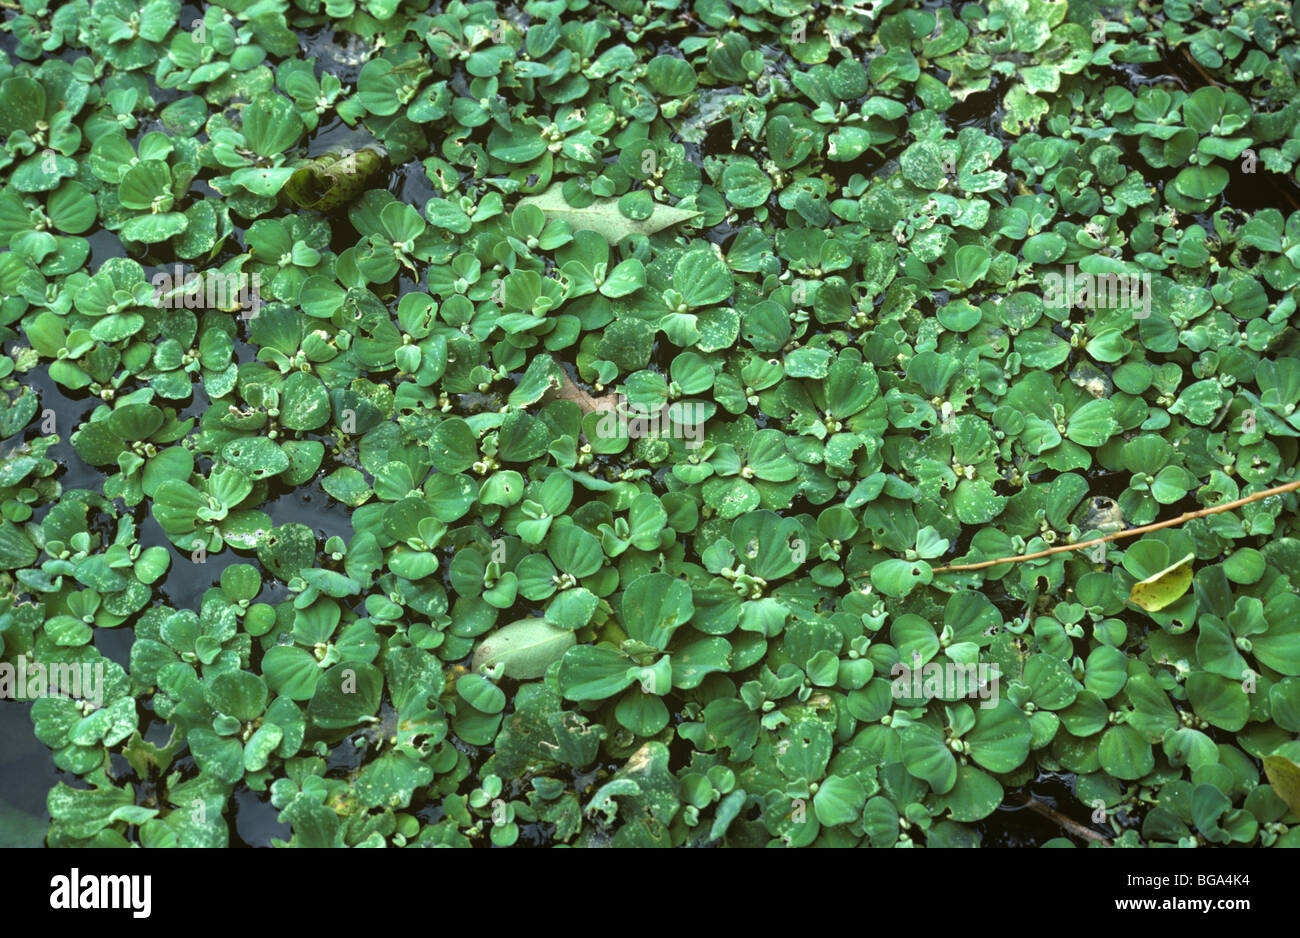 La lechuga de agua (Pistia stratiotes) plantas acuáticas flotantes, Tailandia Imagen De Stock